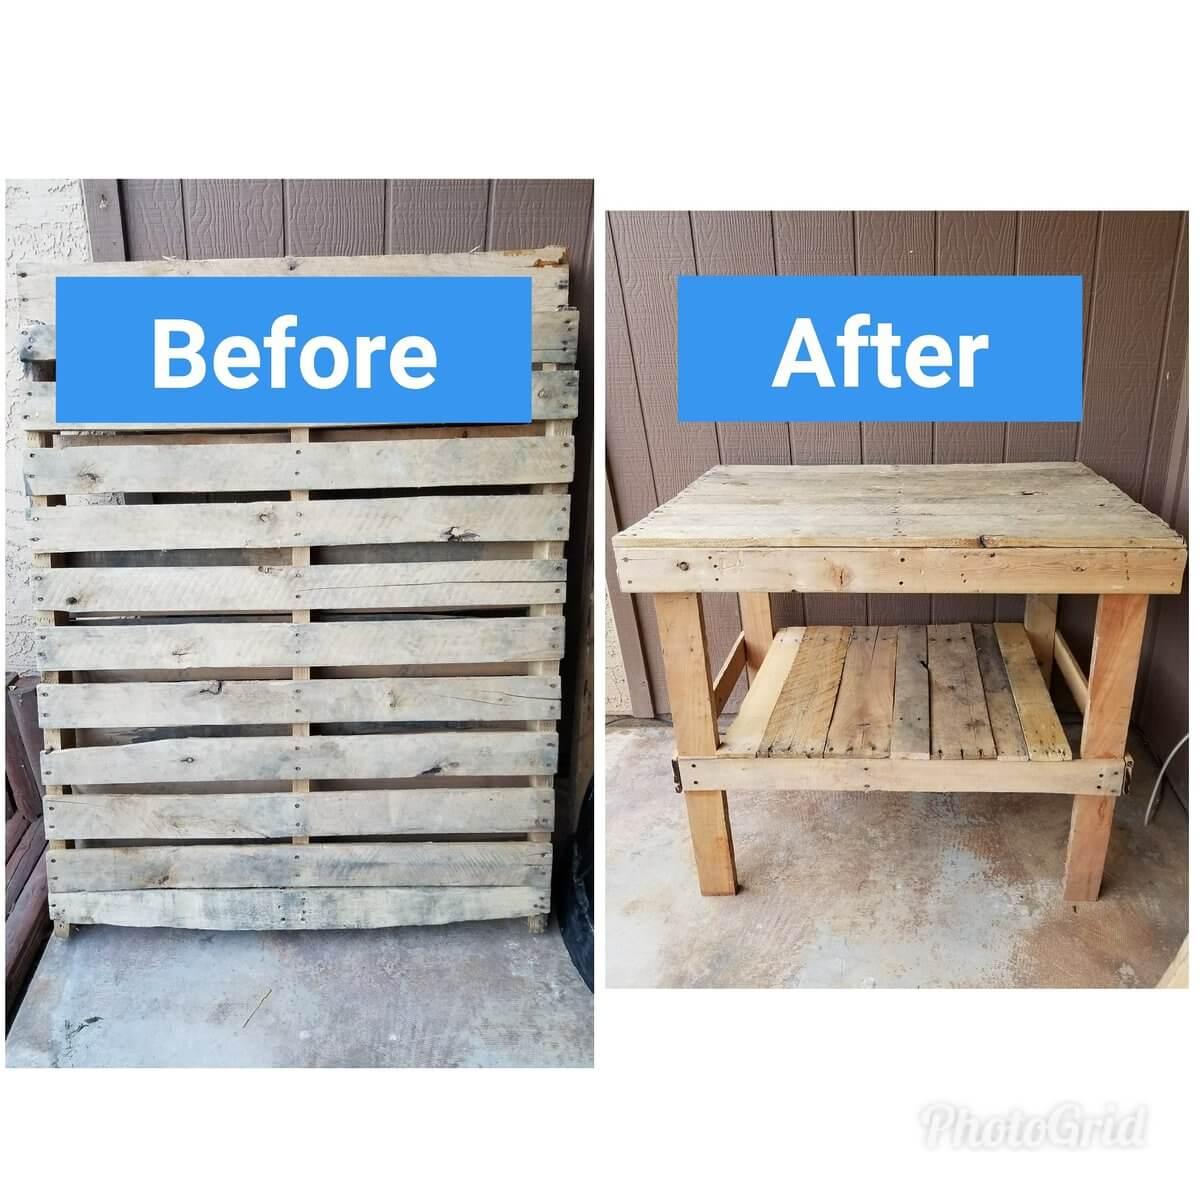 DIY-Wodden-Pallet-Furniture-Projects-101